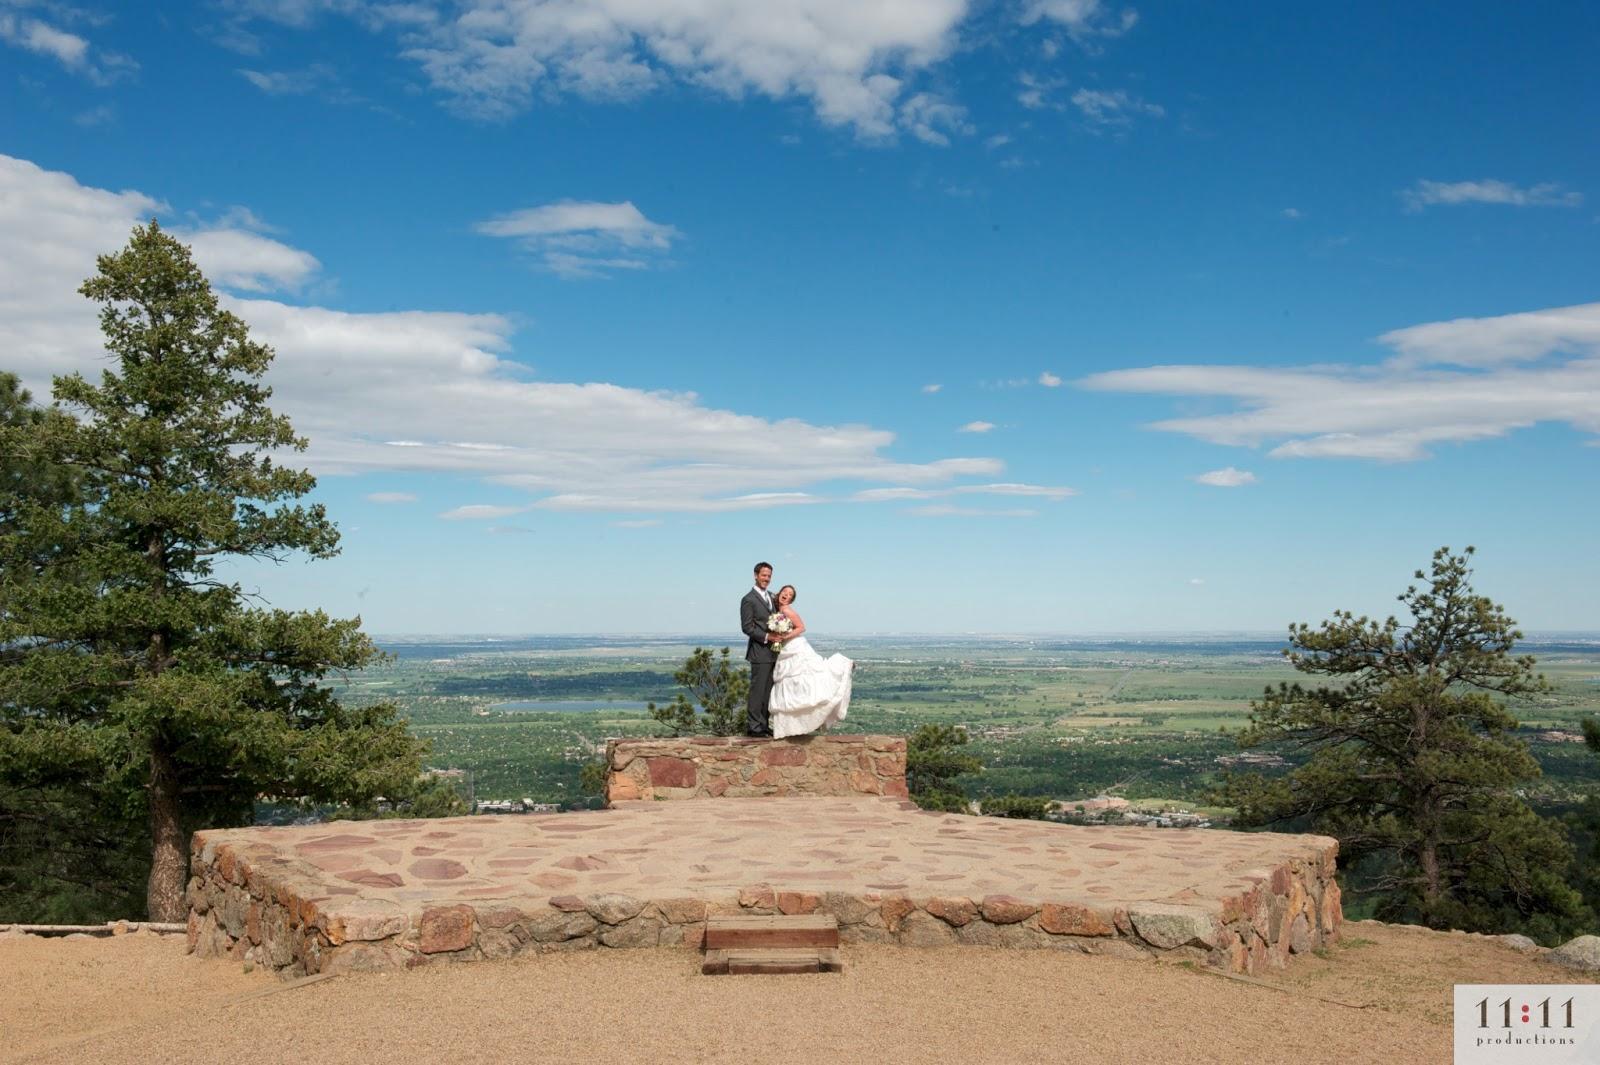 Boulder colorado wedding photography 1111 productions for Boulder wedding photographer